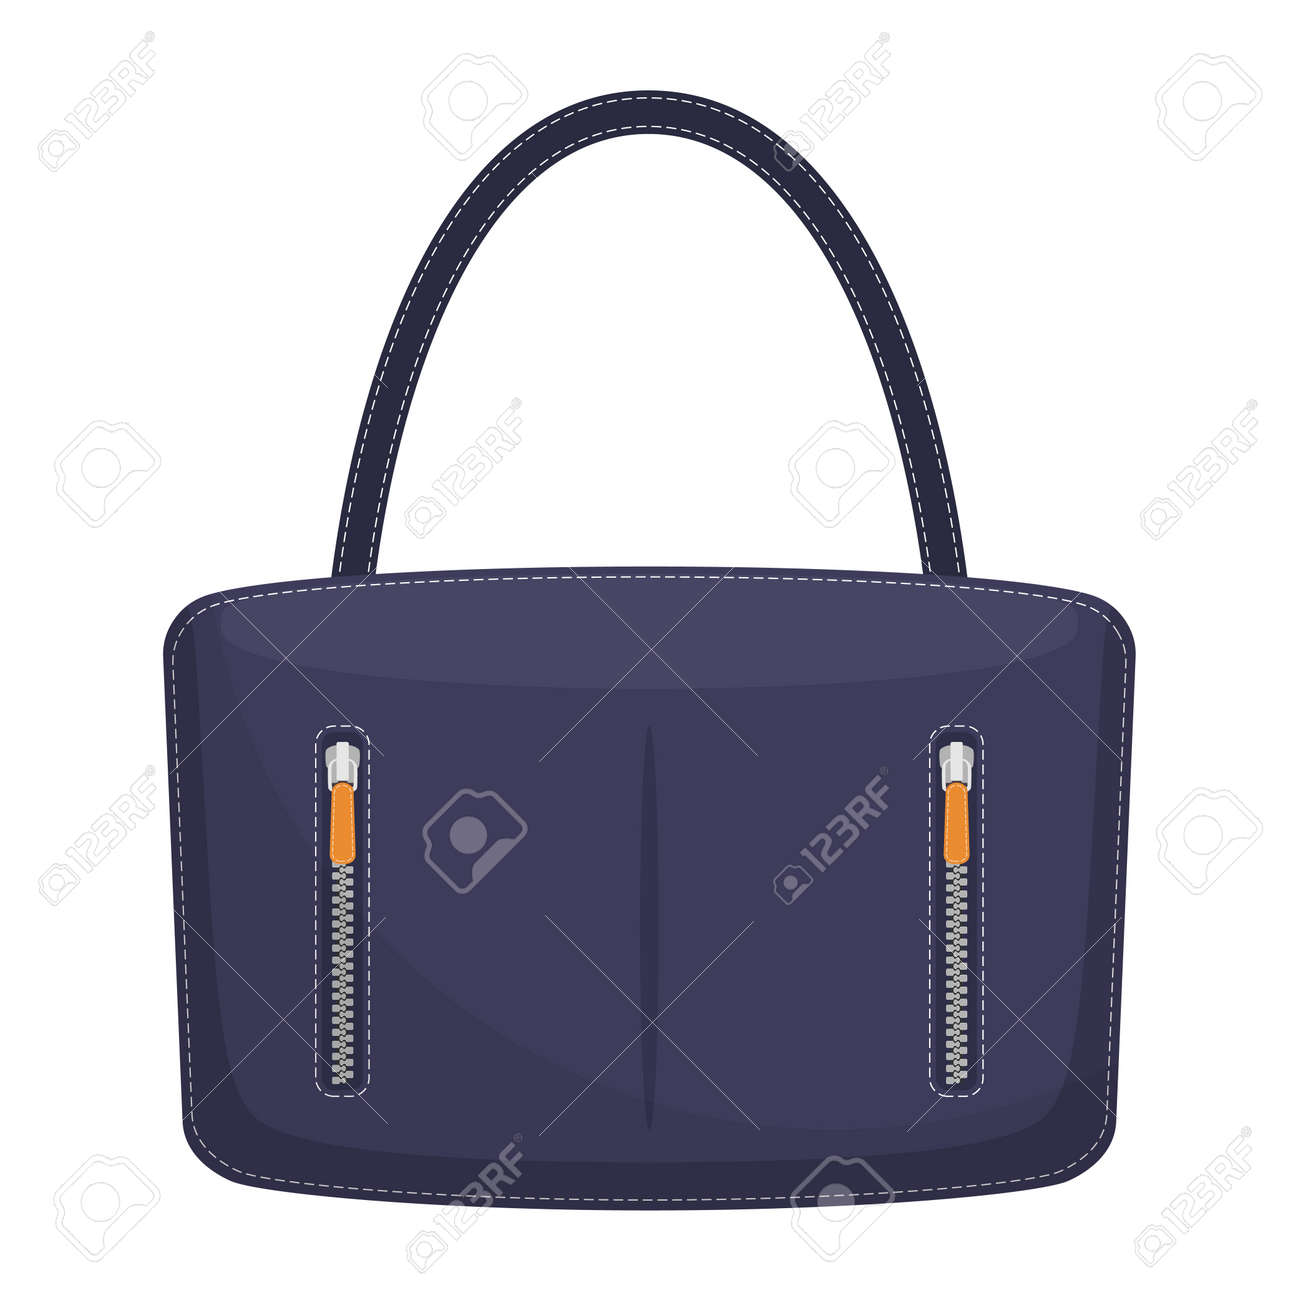 d6f378f62b Stylish colorful leather handbag with white stitching. Fashionable women s  bag isolated on white background